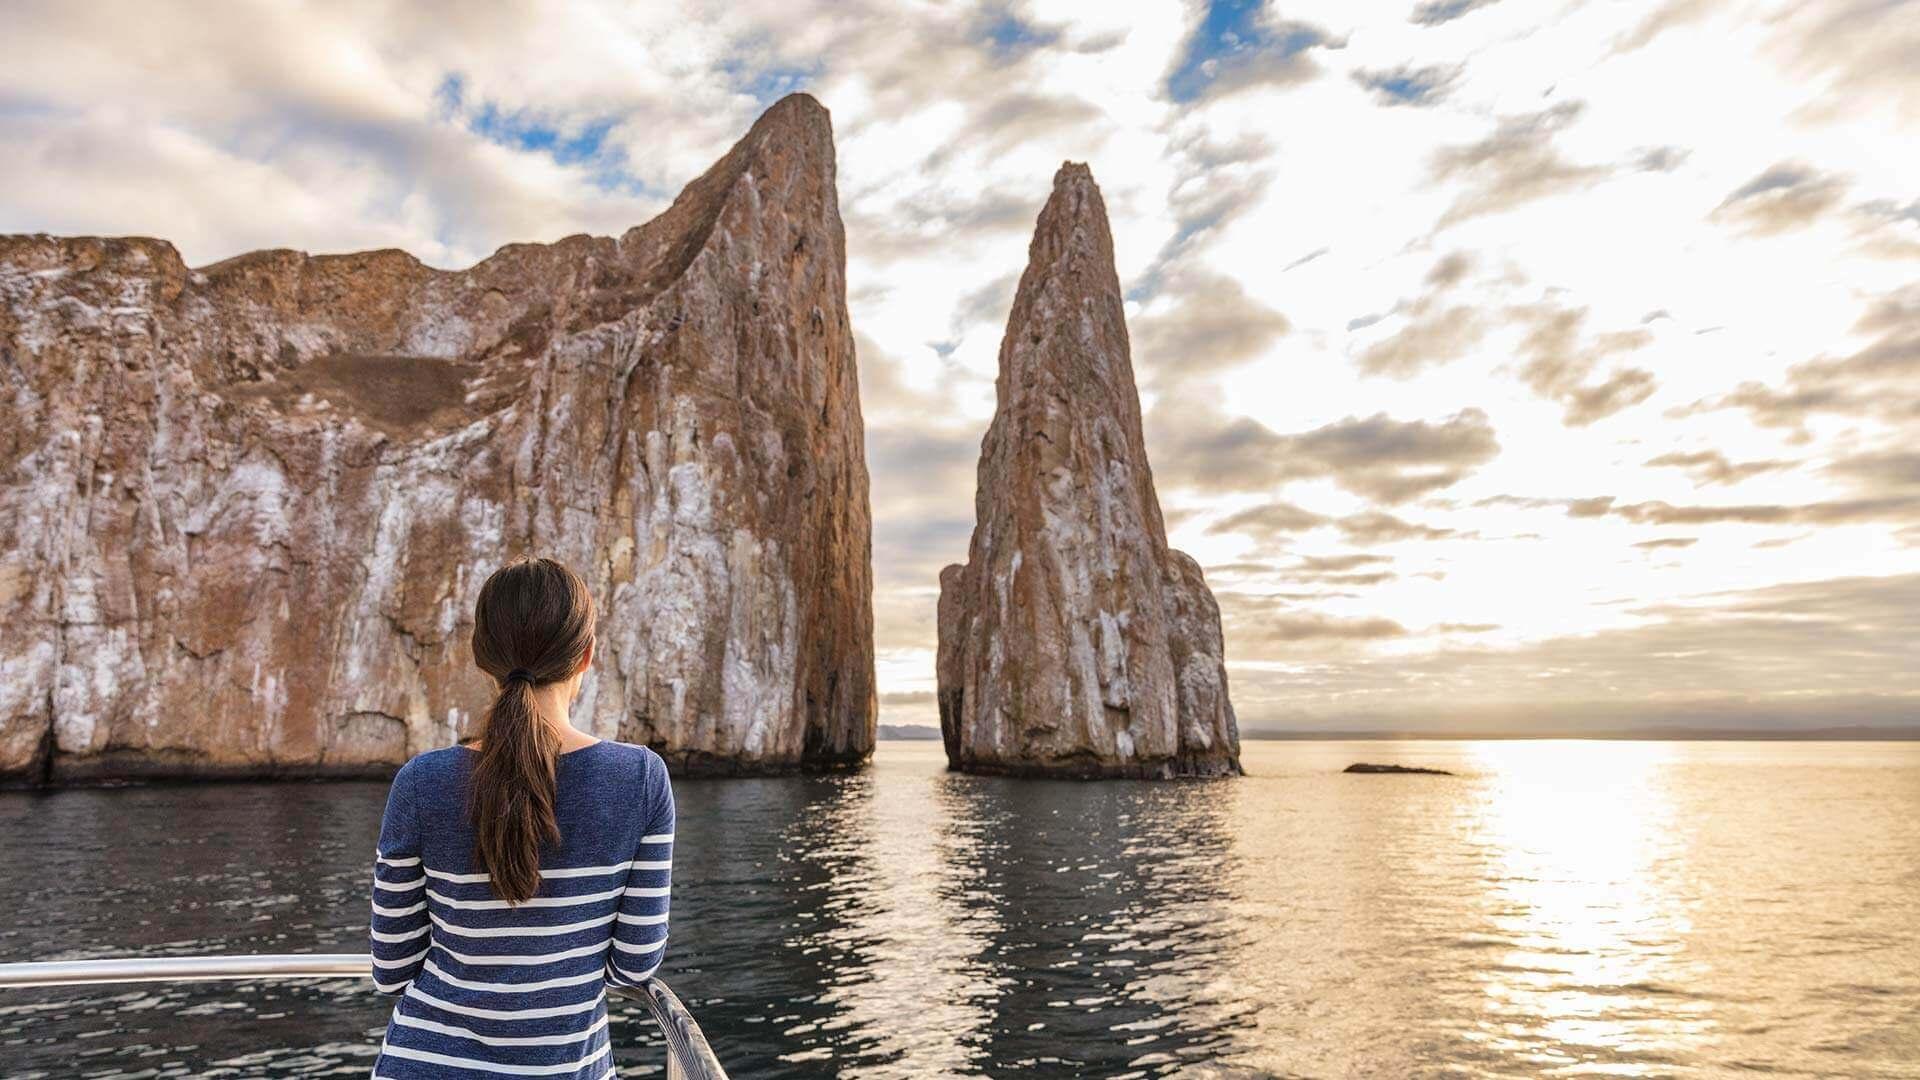 galapagos tourist admires the view of kicker rock leon dormido at san cristobal island